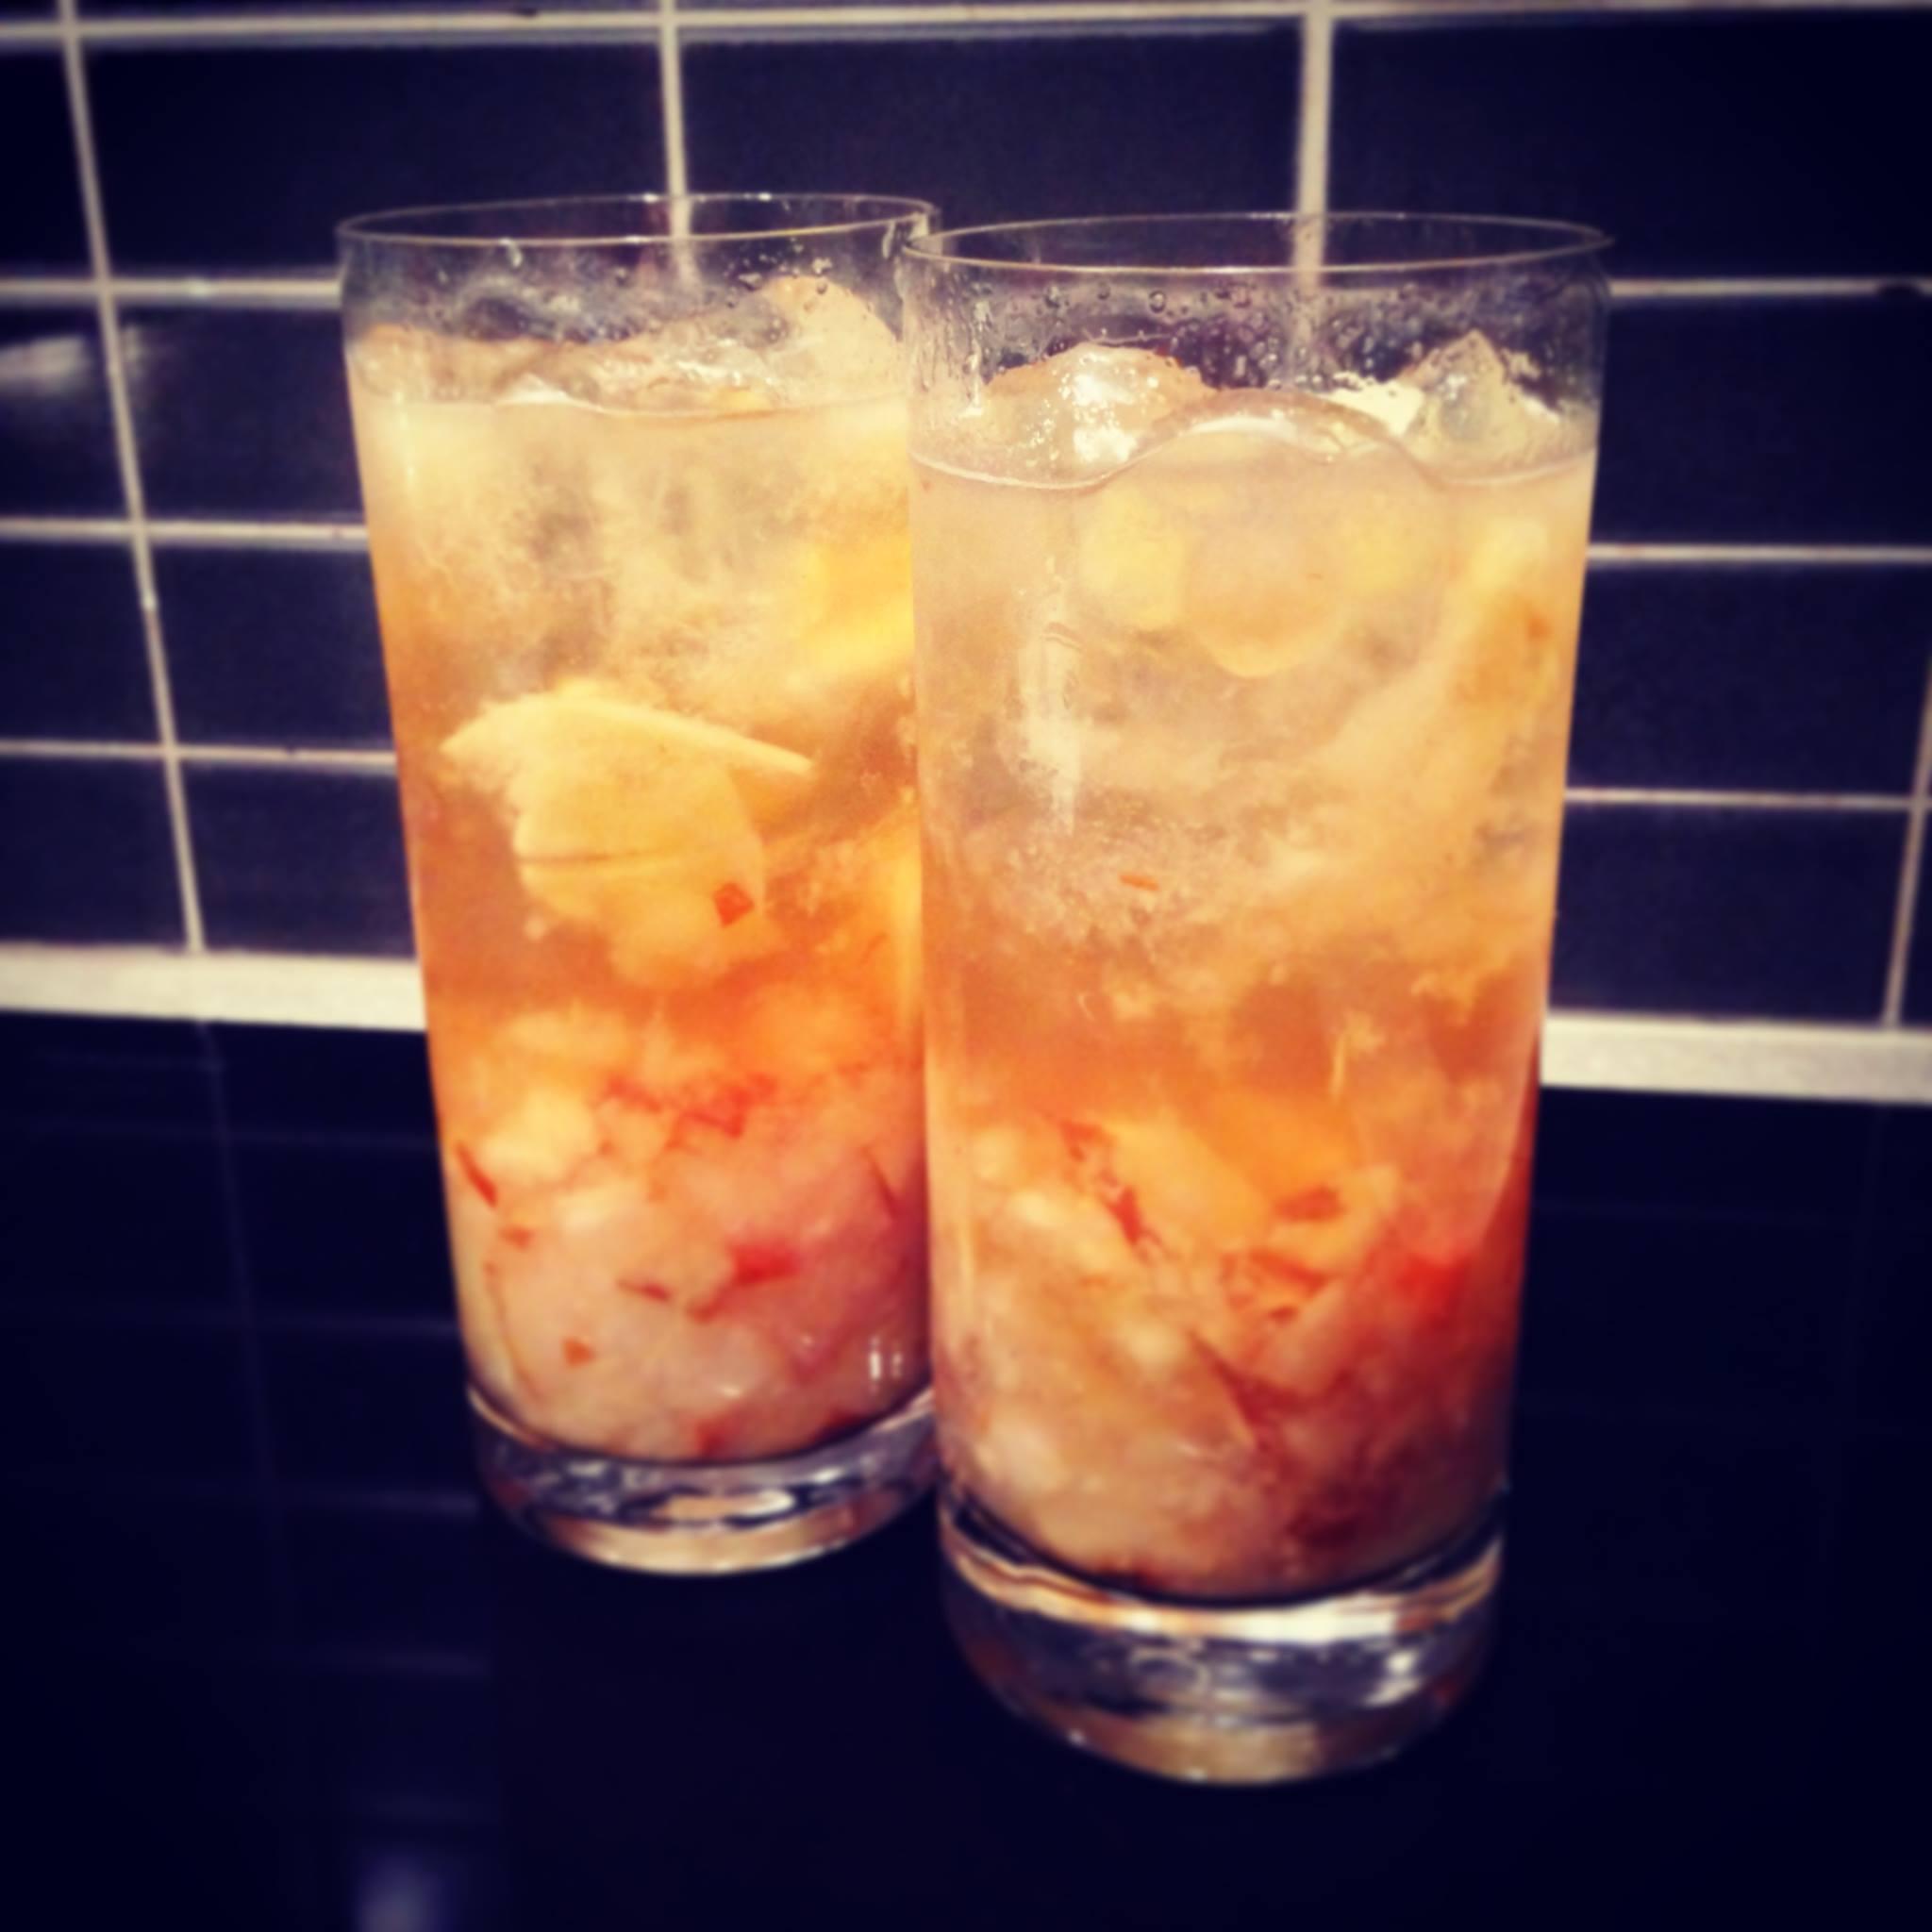 'Pear Haymaker' - Drinken som ingen kan motstå.